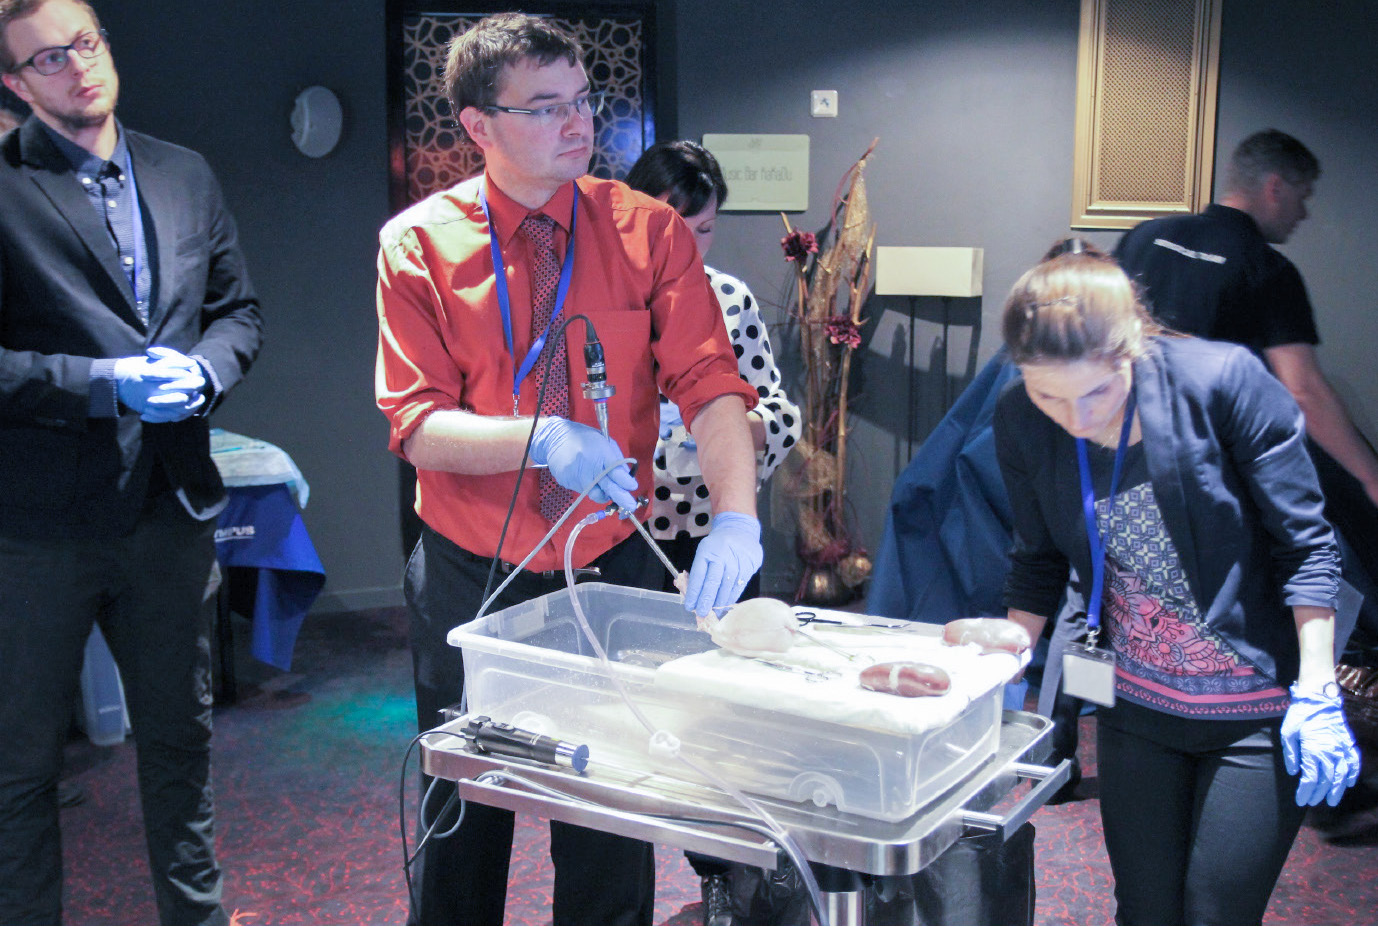 Obr. 7. Hands-on training endoskopie močových cest na prasečím modelu (Olympus)<br> Fig. 7. Hands-on training porcine urinary tract endoscopy (Olympus)